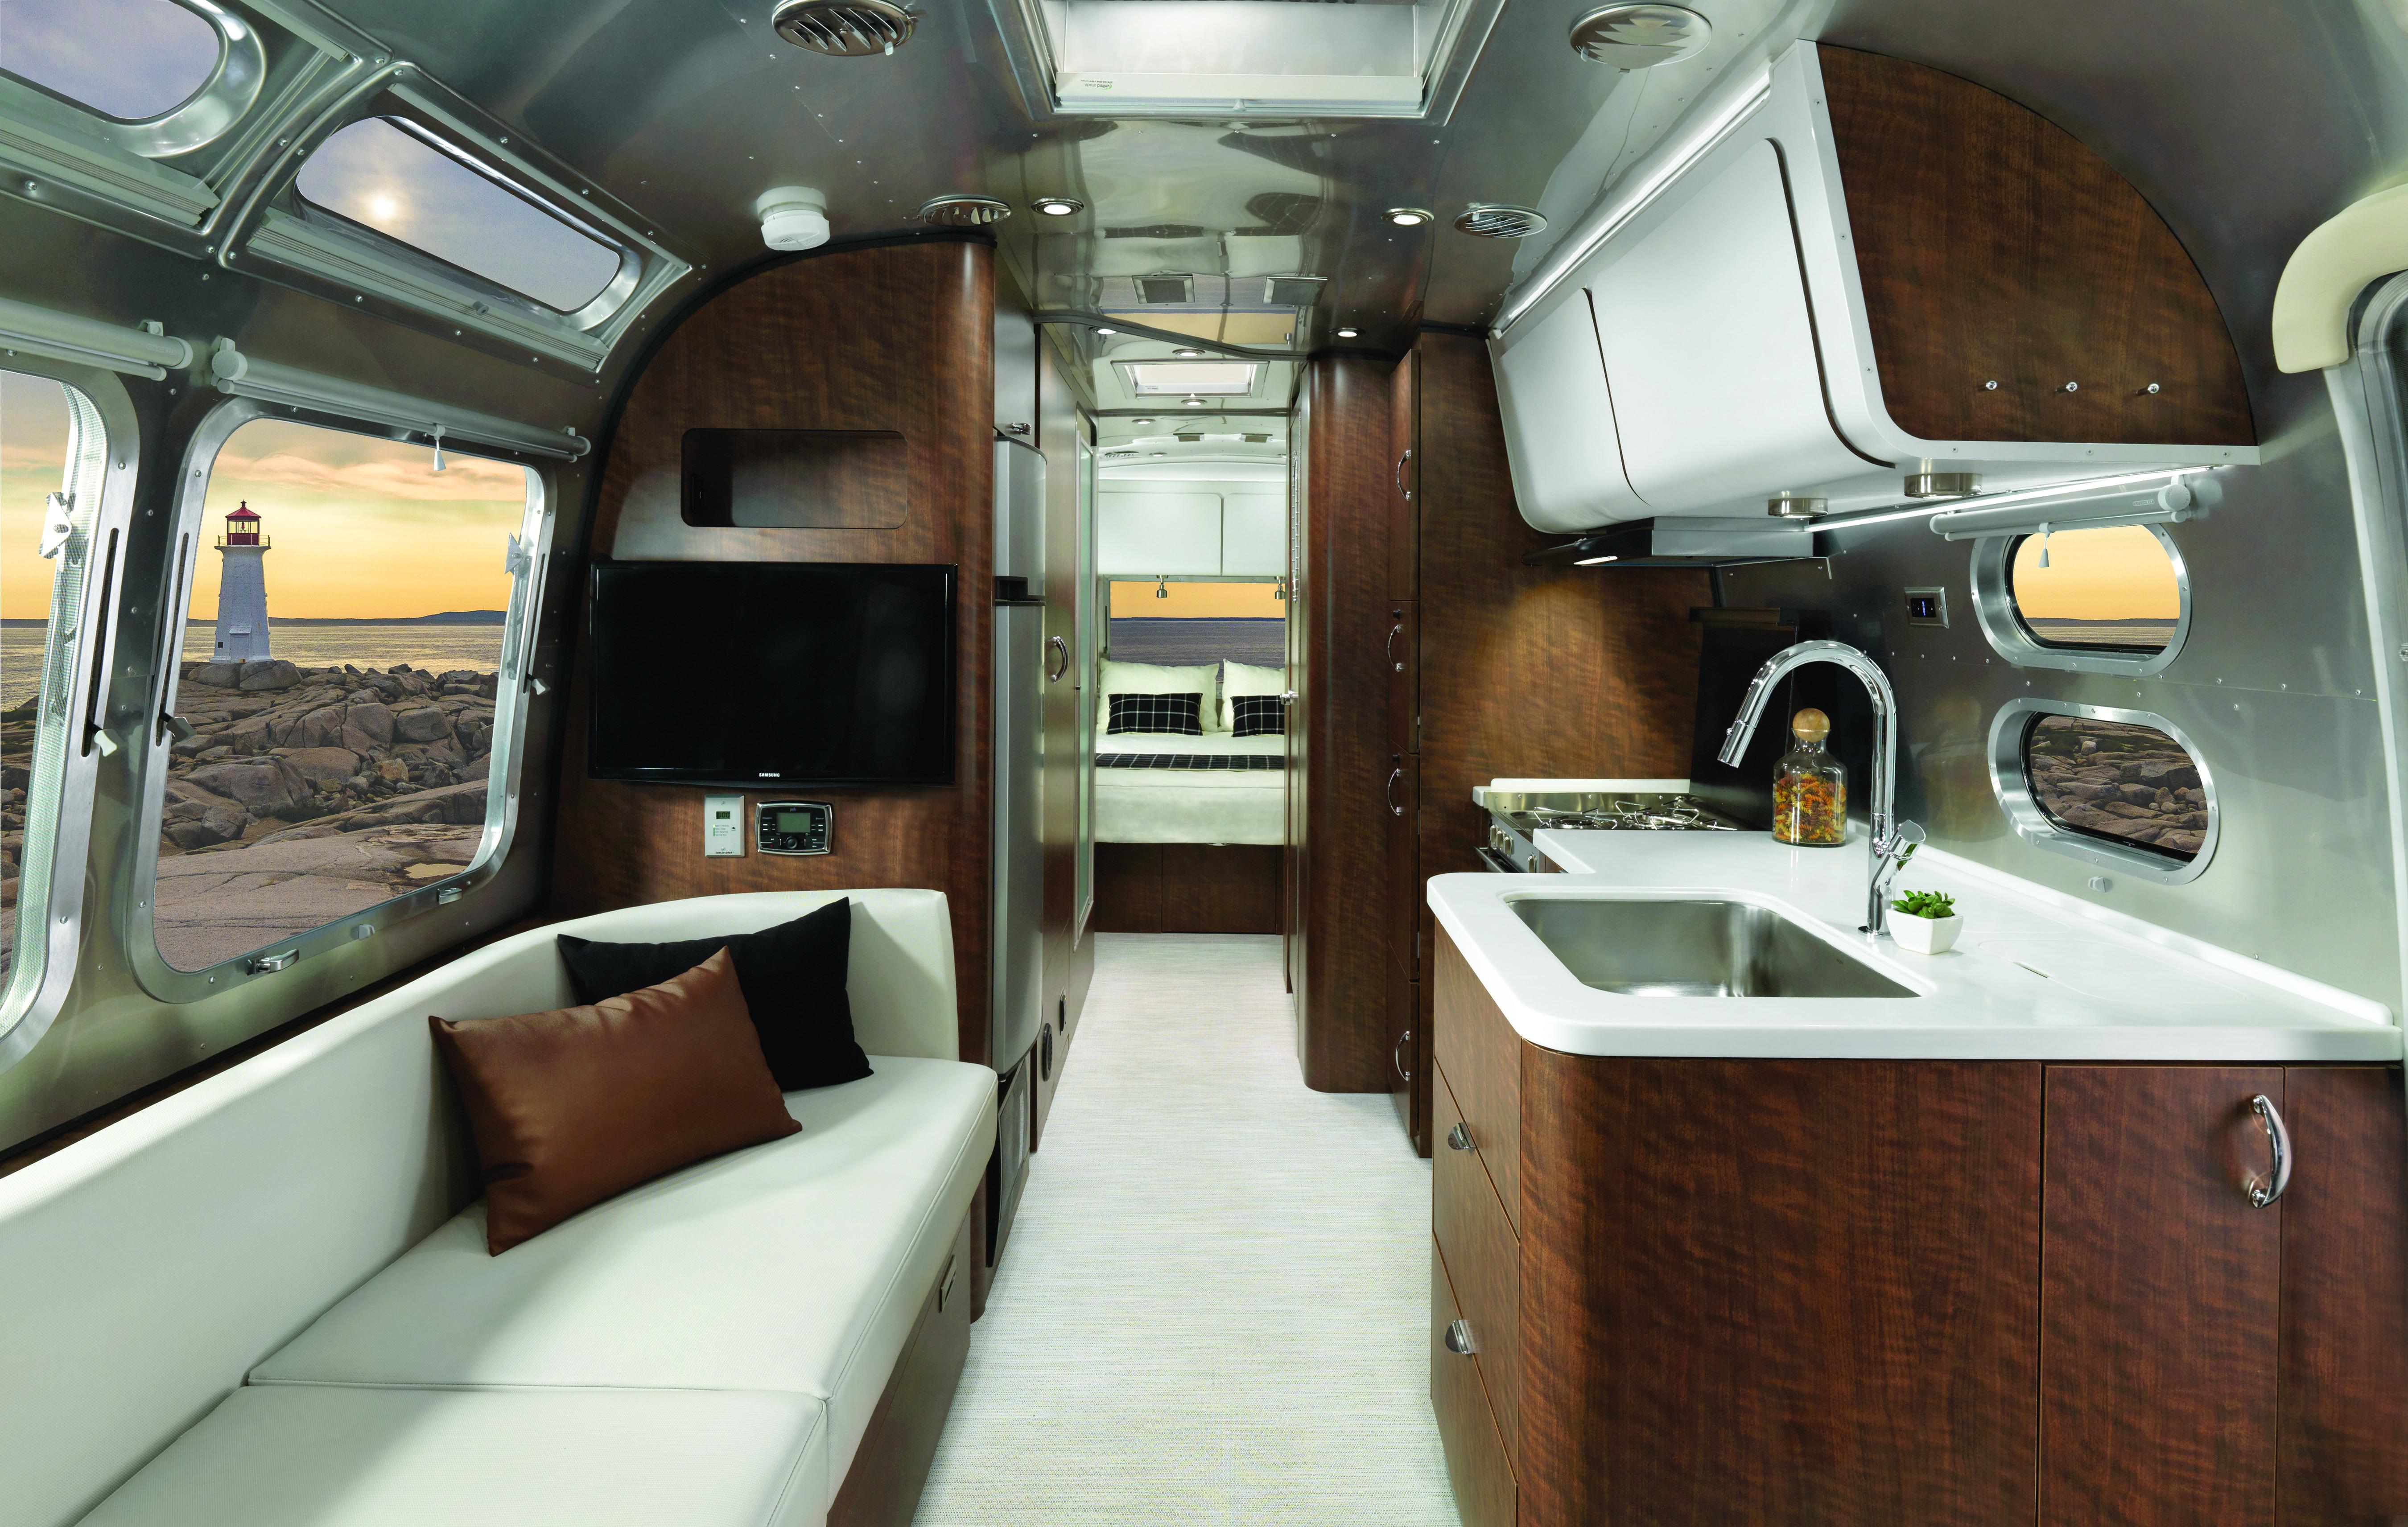 Airstream Debuts New European Inspired Travel Trailer